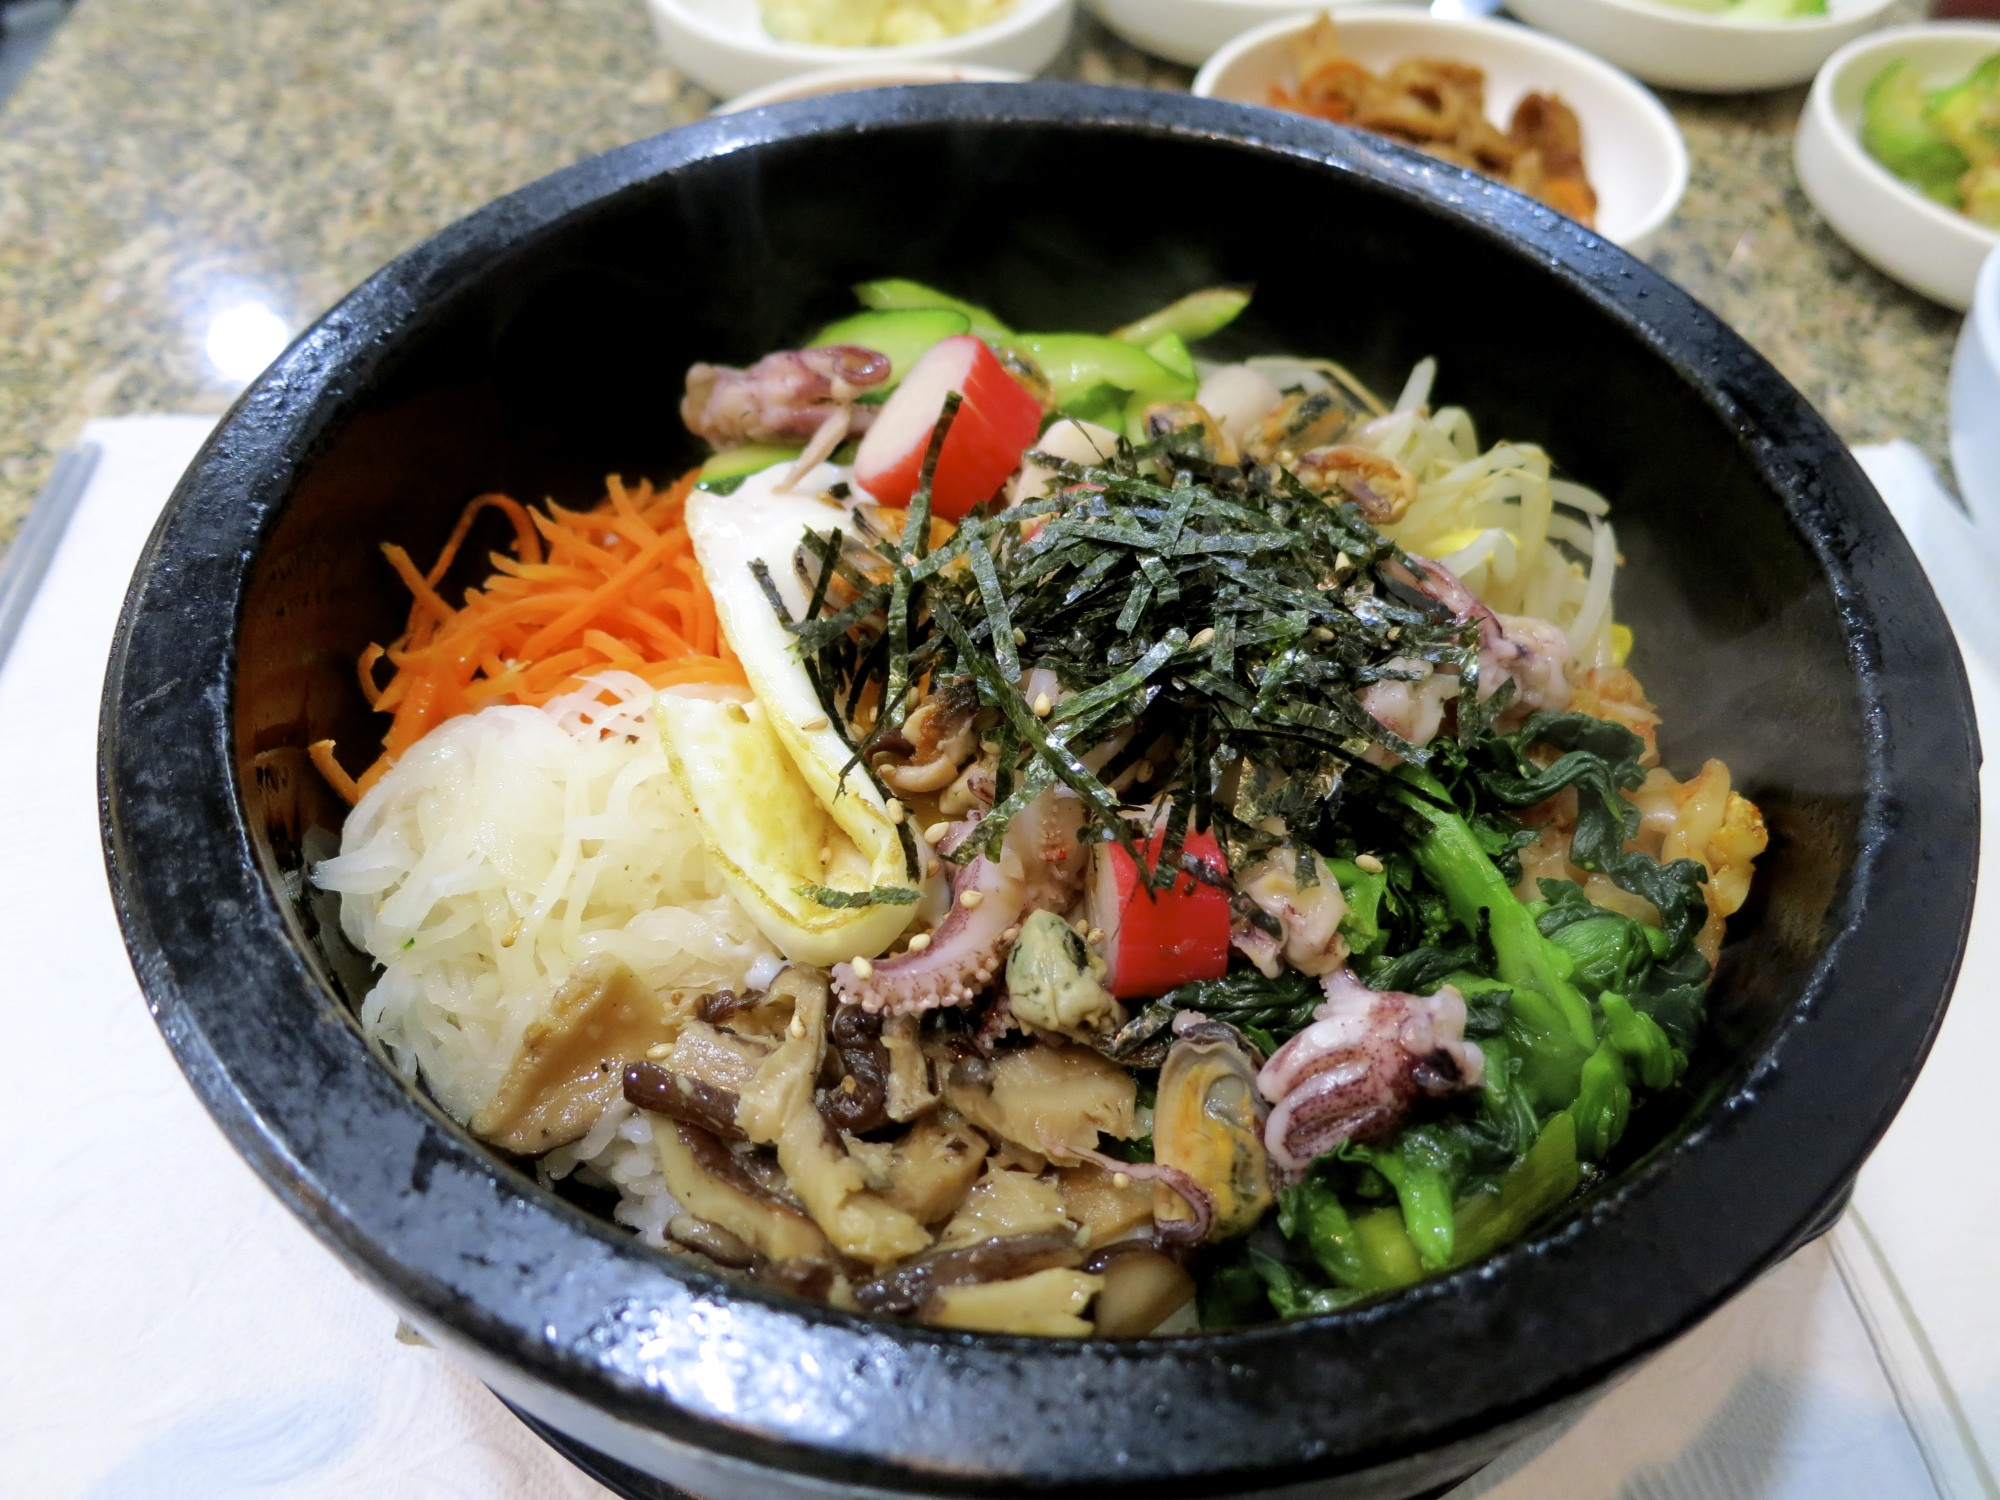 Haemool Dor Sot Bibim Bap ($10.19)